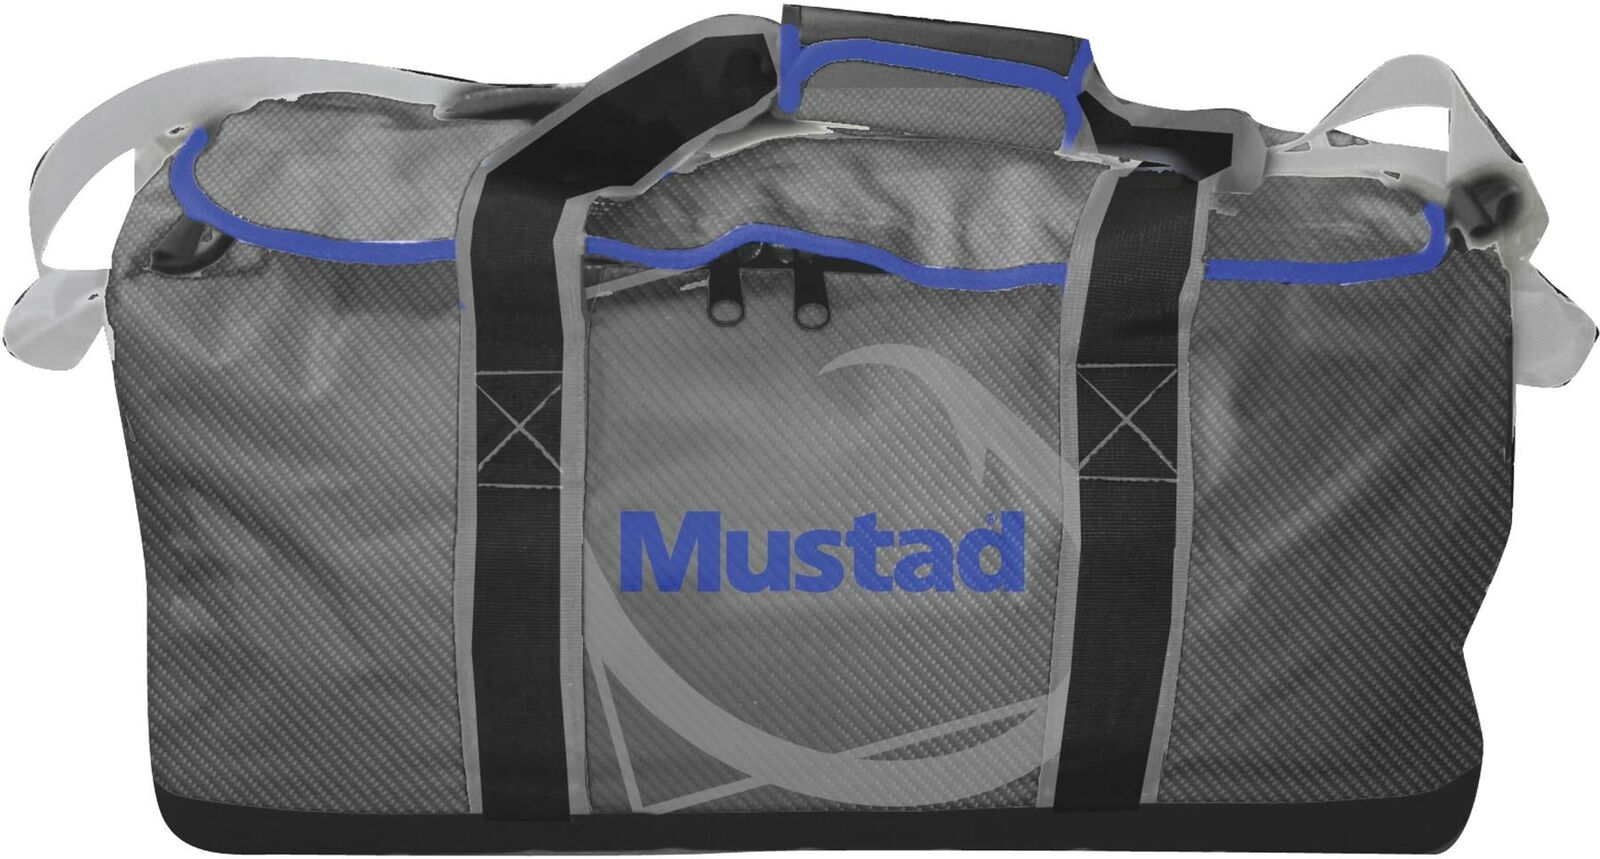 Mustad Boat Tasche 24  500D Tarpaulin PVC   Fishing